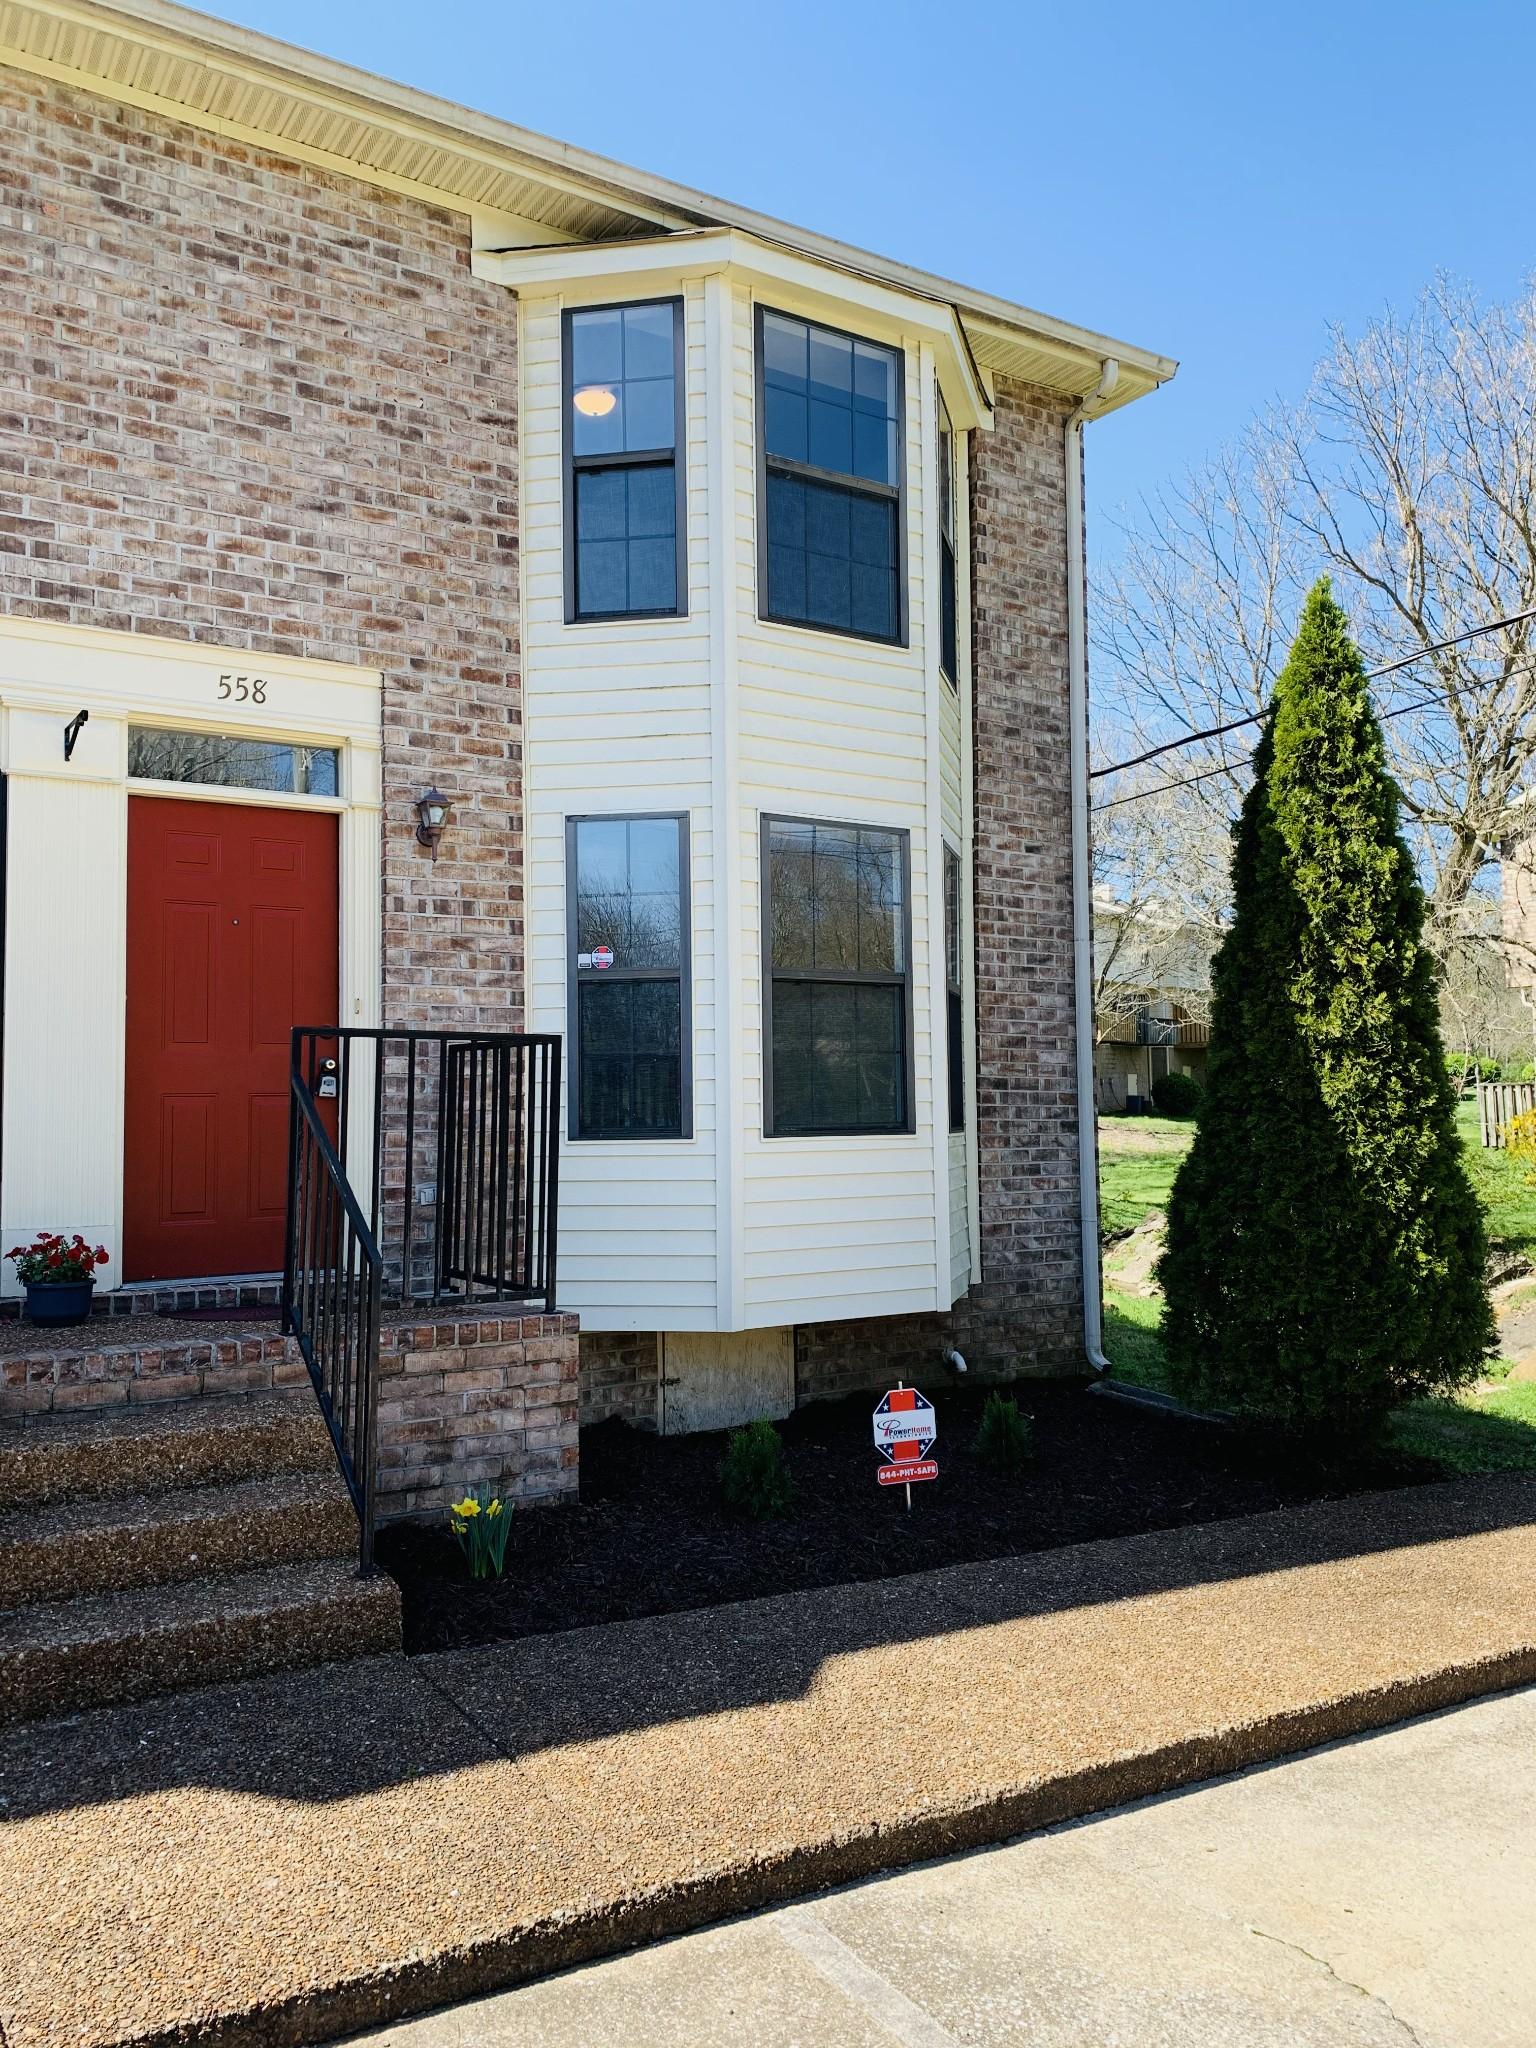 558 Thomas Jefferson Cir Property Photo - Madison, TN real estate listing